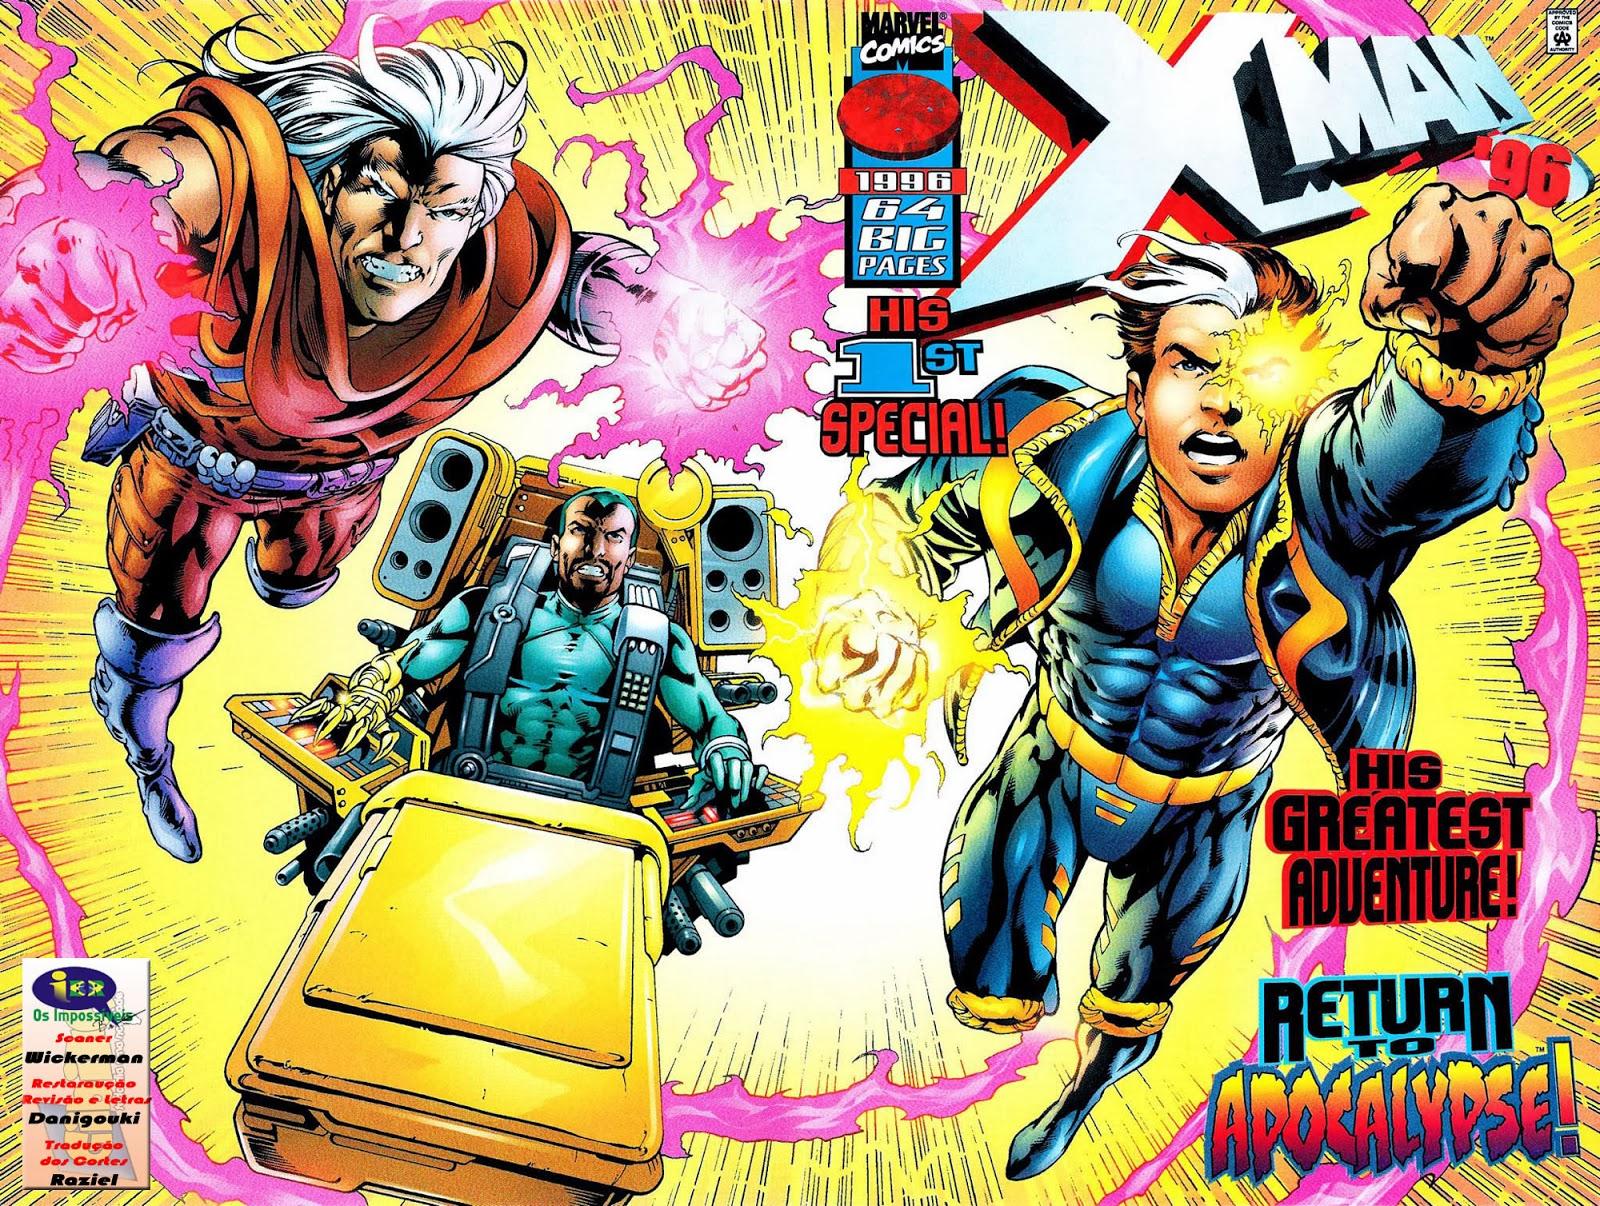 X-Men - A Era do Apocalipse #5